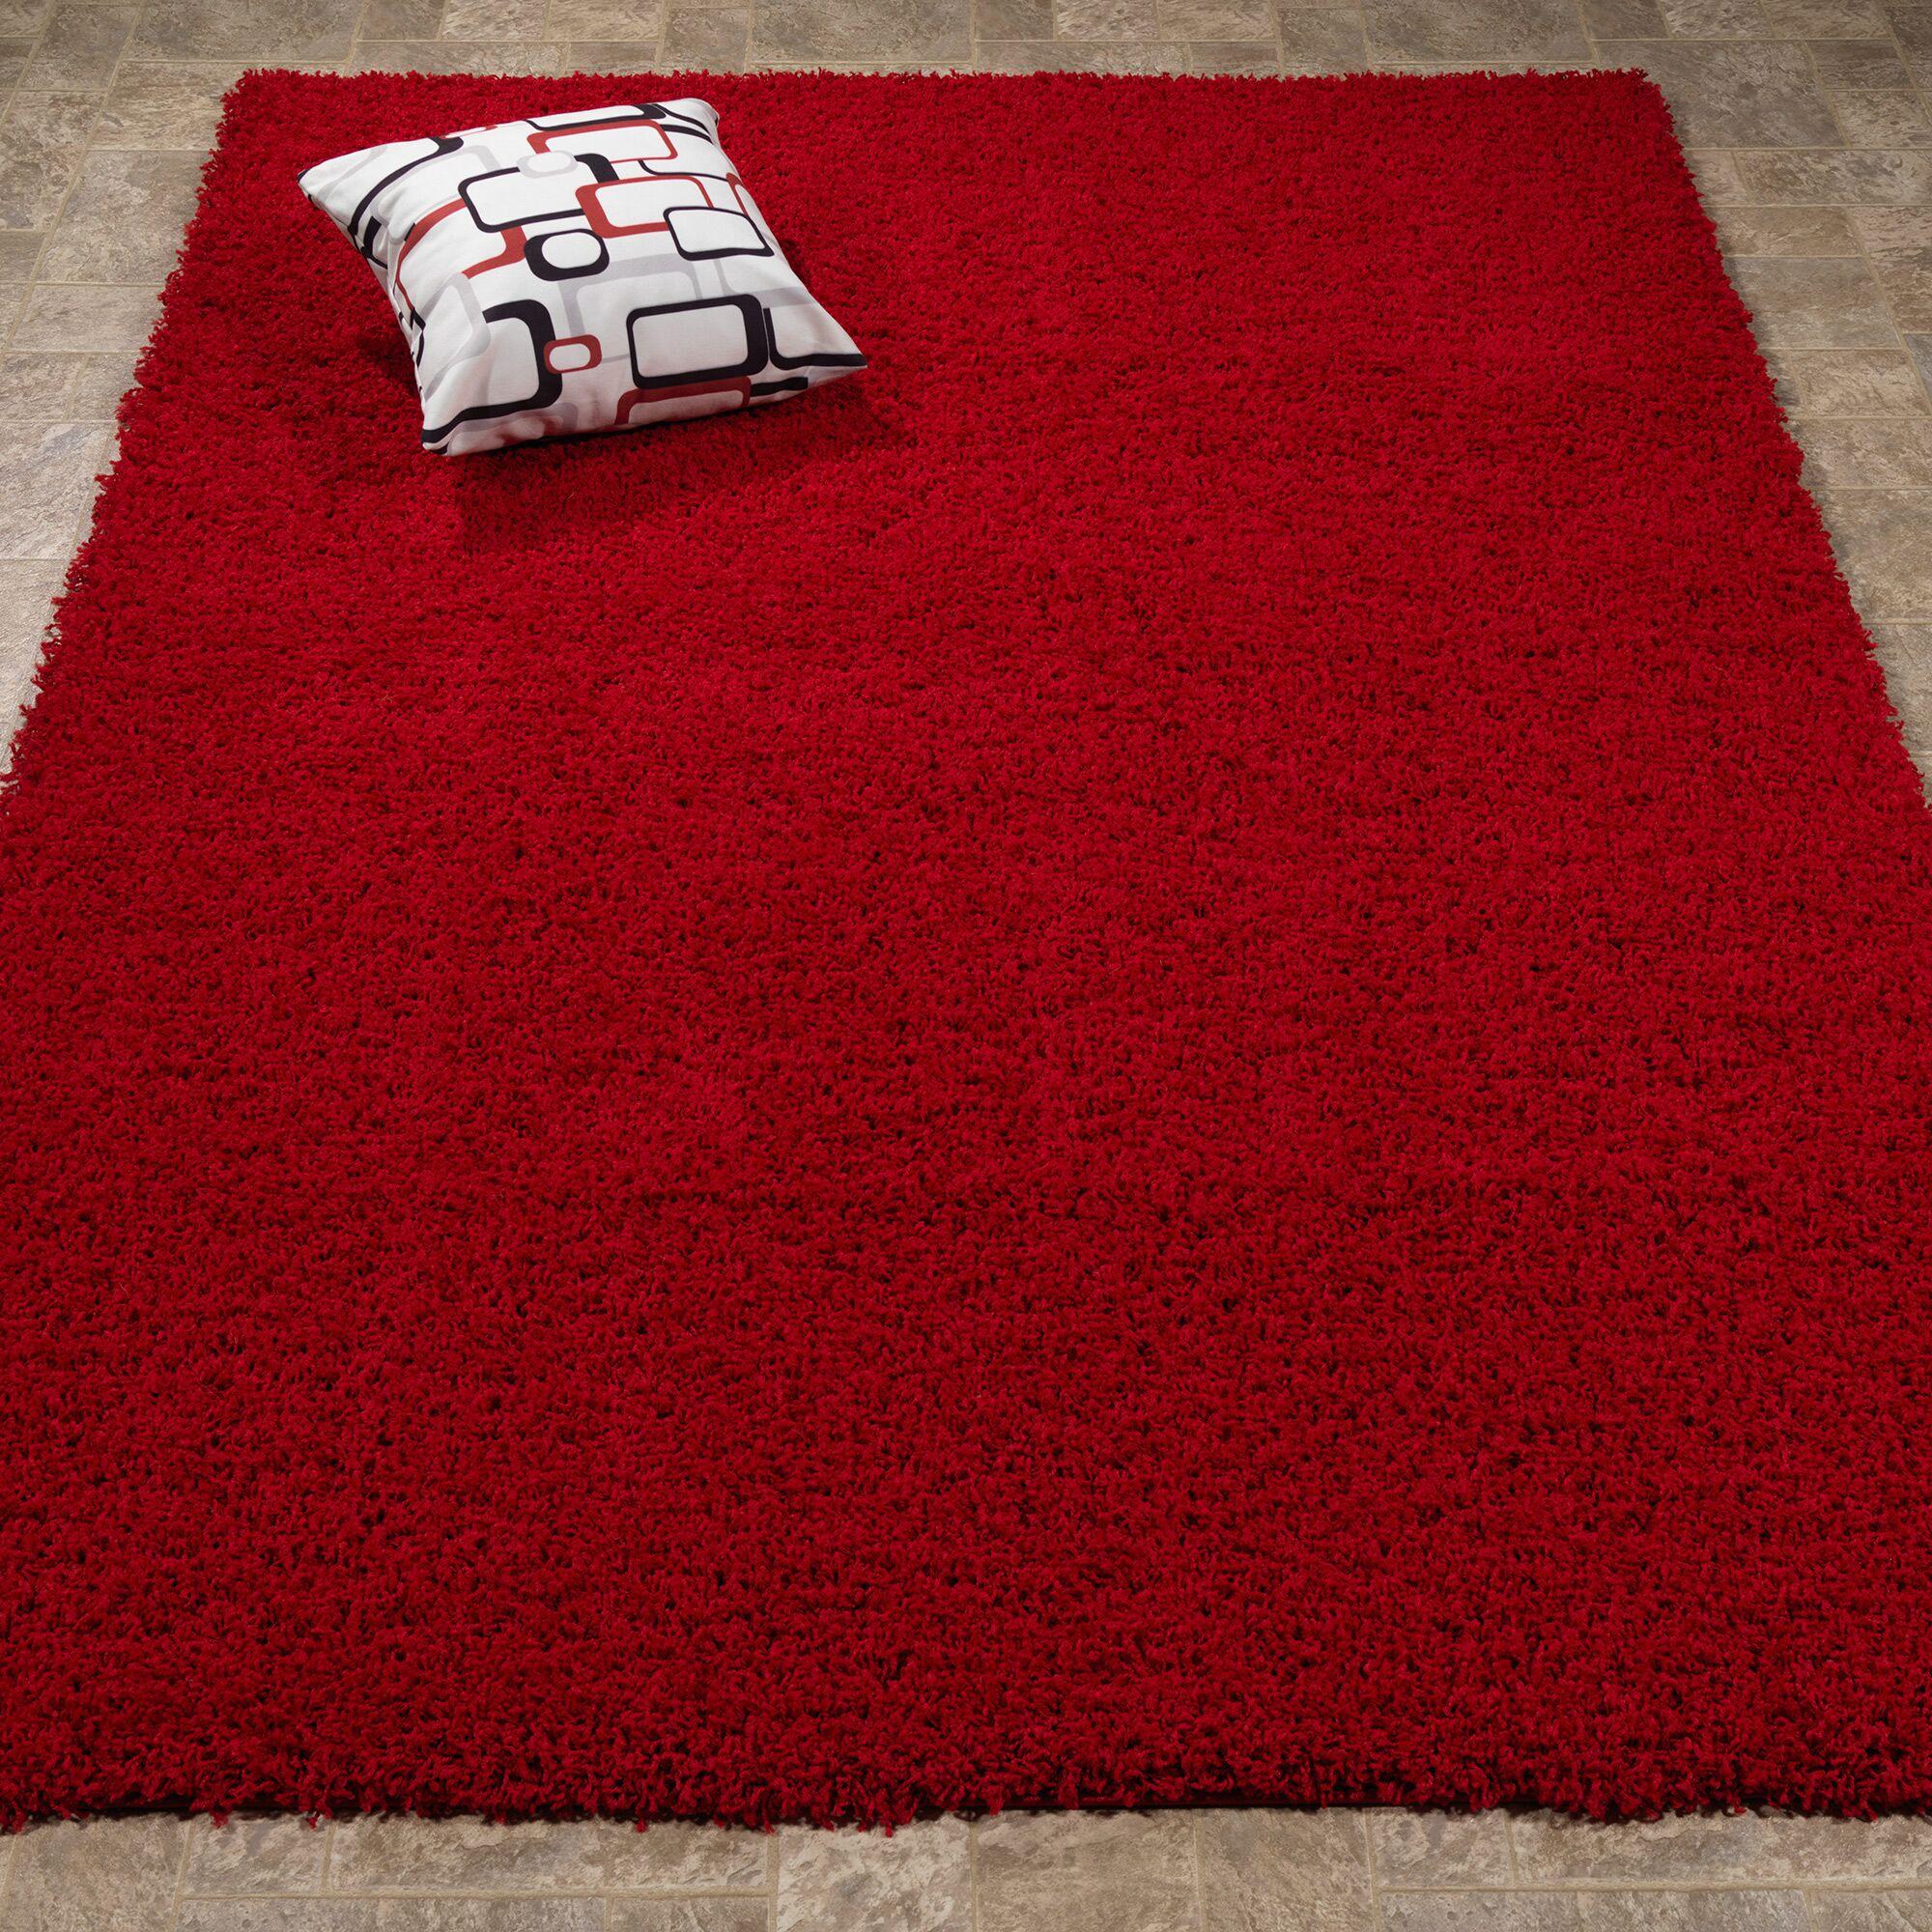 Shiiba Red Solid Area Rug Rug Size: Rectangle 6'7